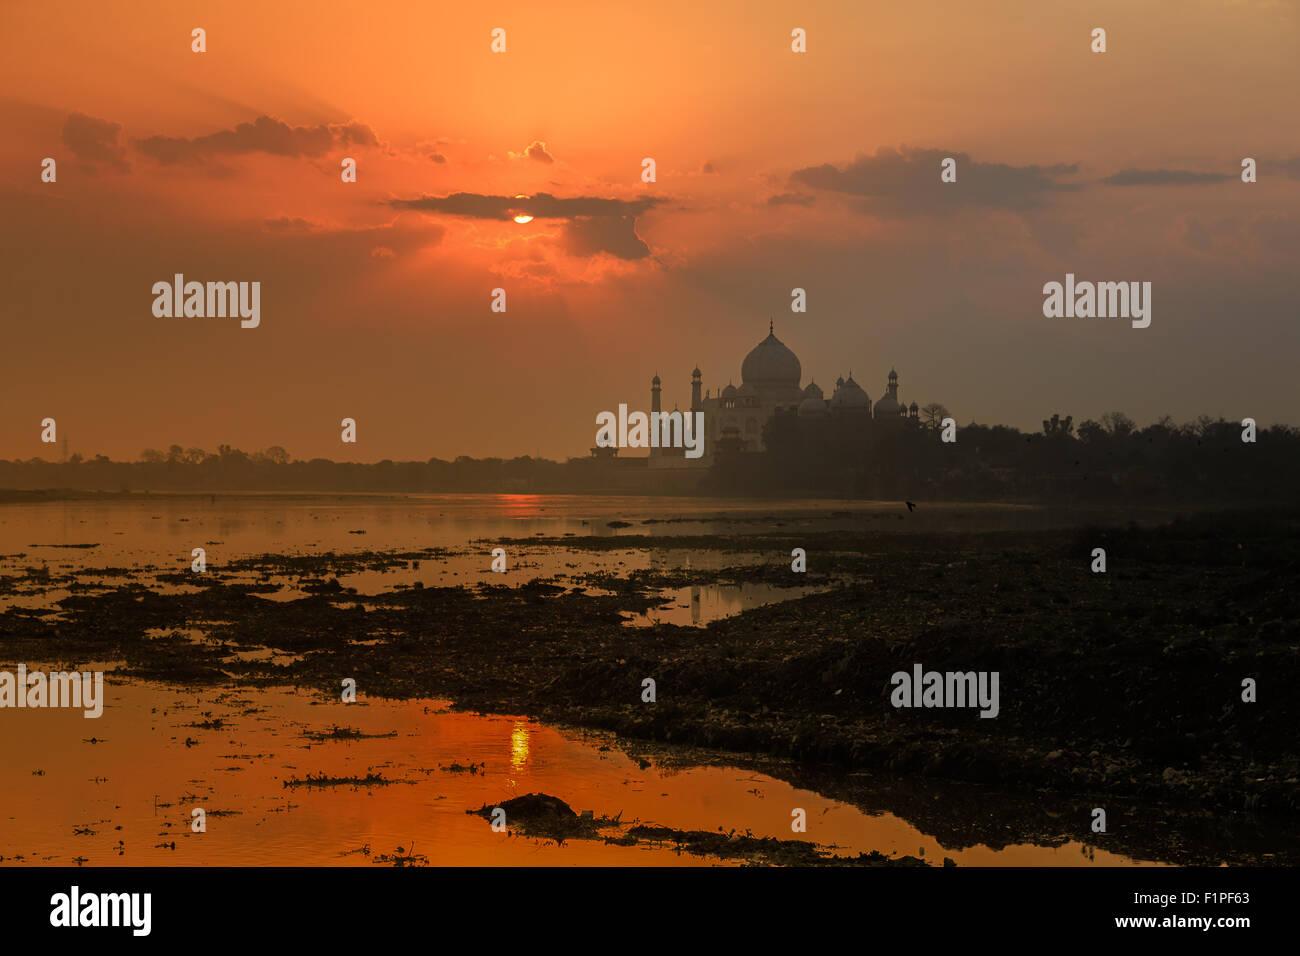 Una puesta de sol vista del Taj Mahal, en Agra, India. Imagen De Stock